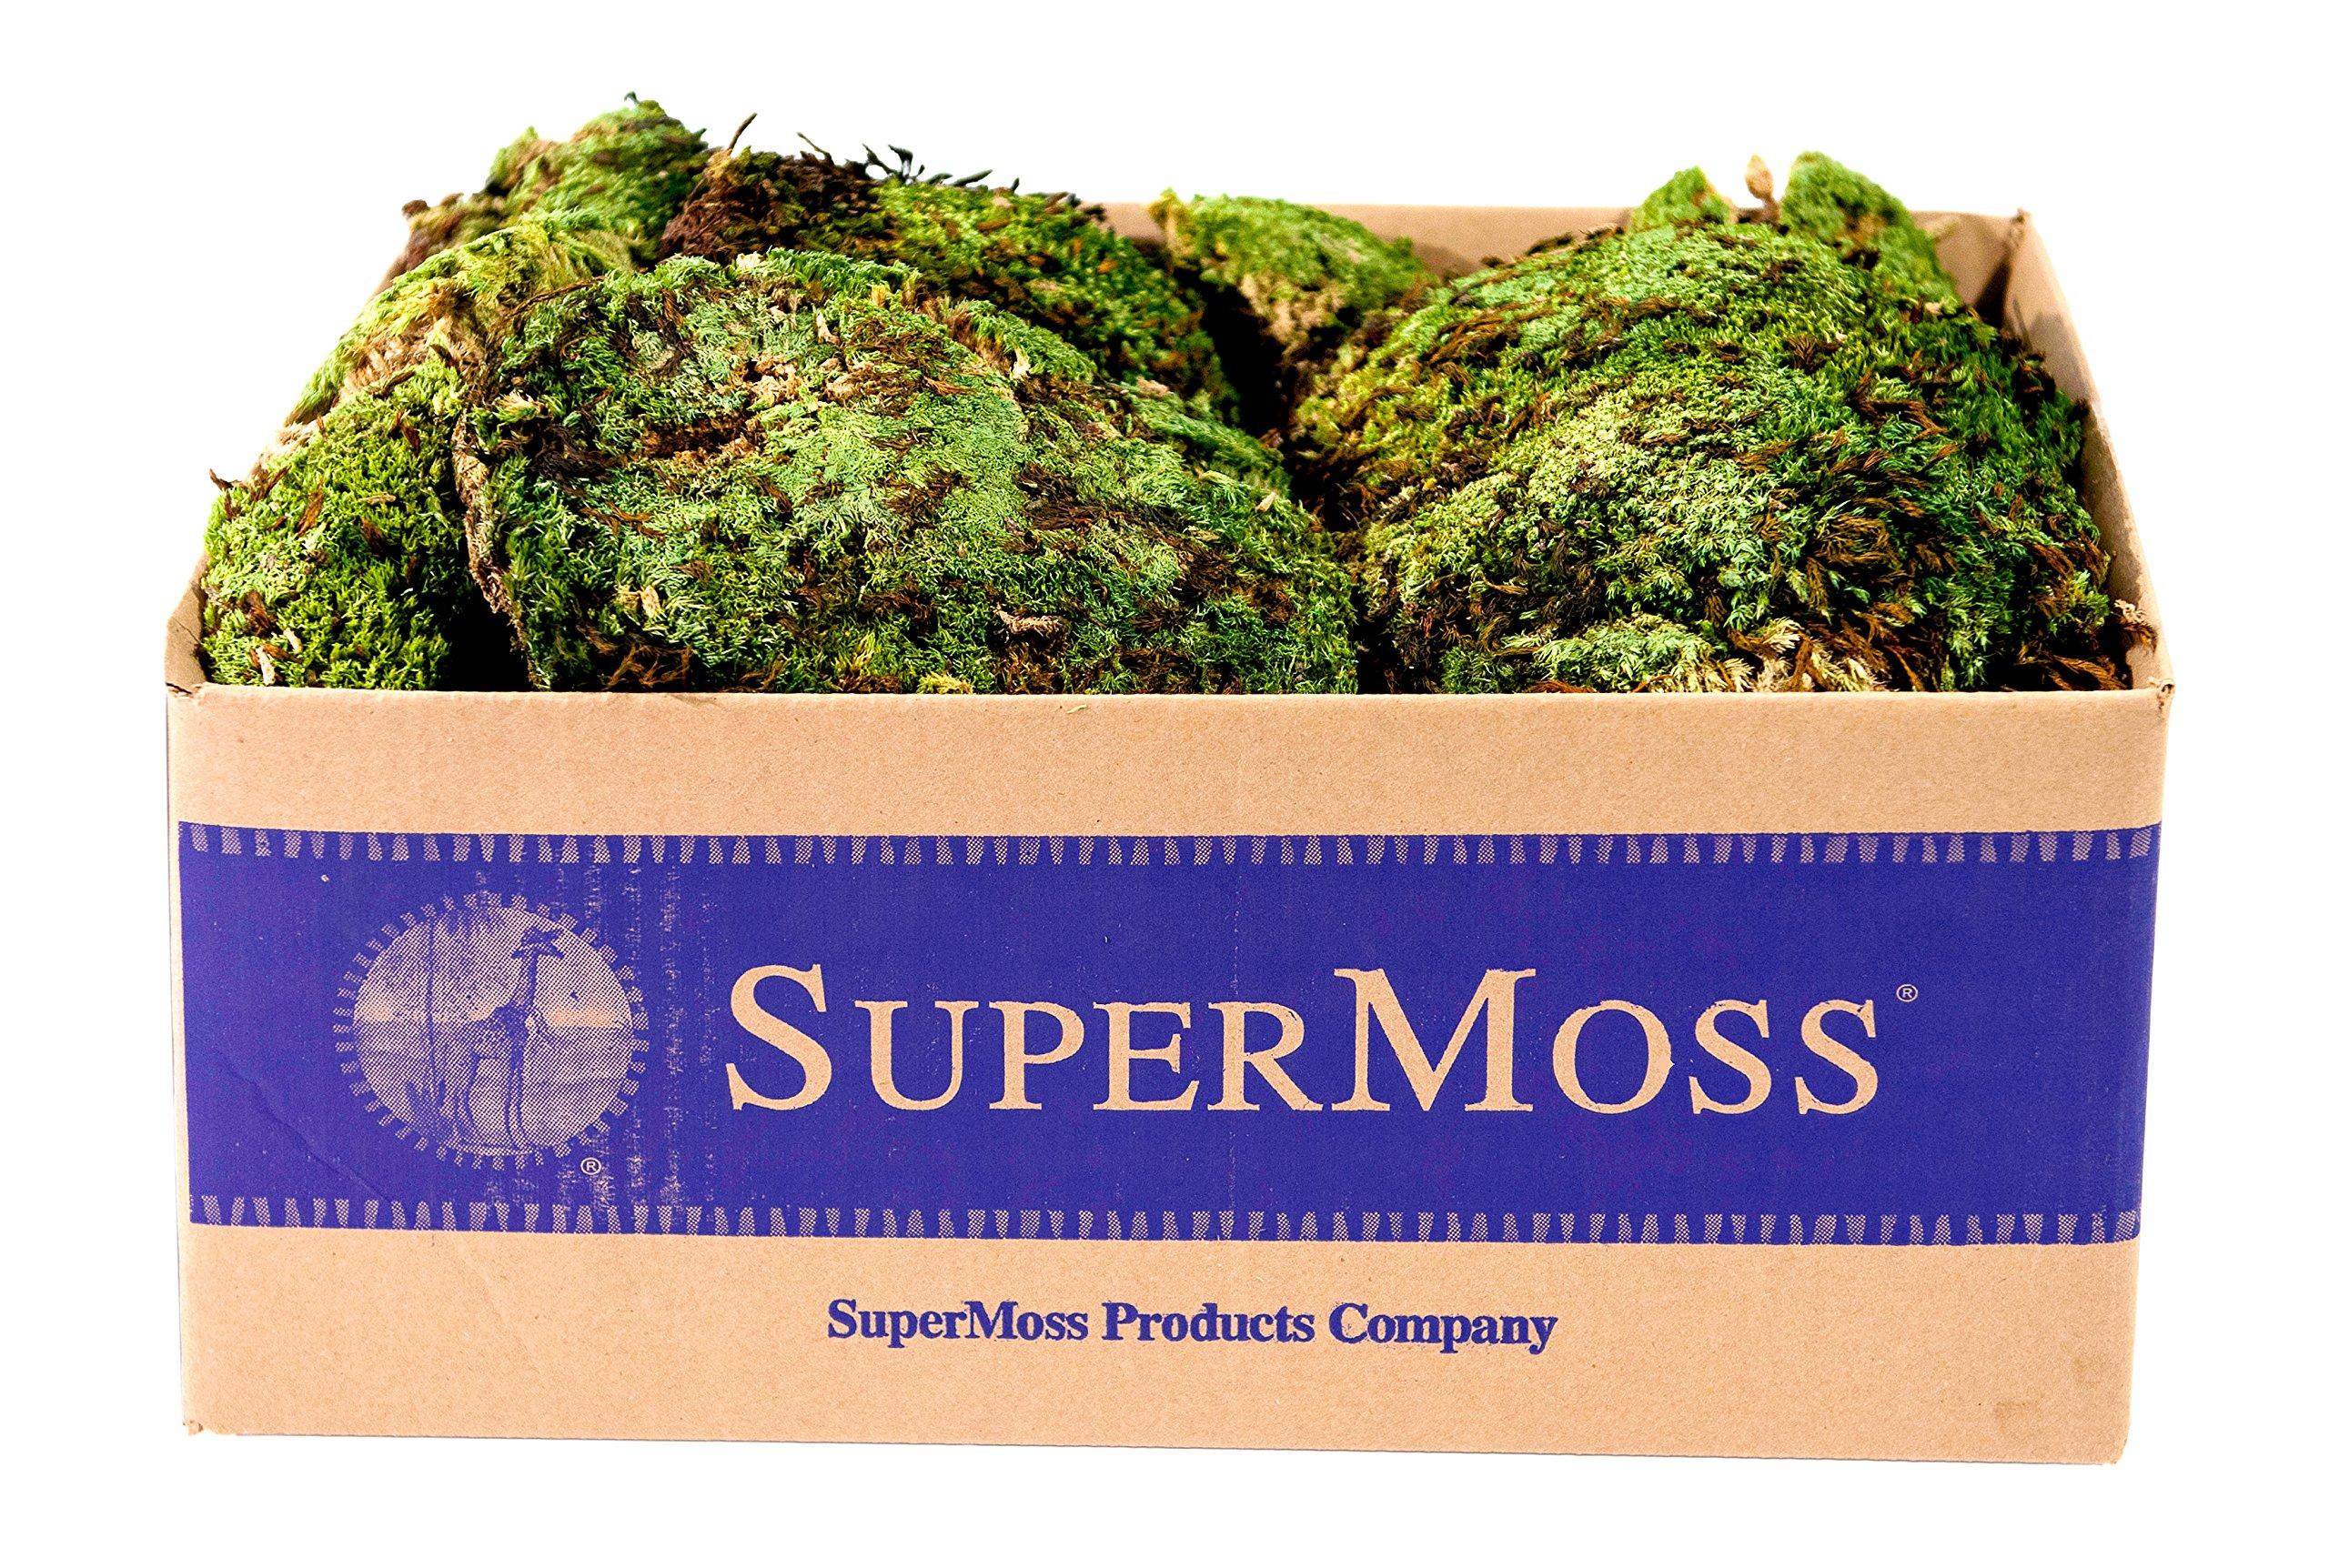 SuperMoss (21881) Royal Pool Moss Preserved, Fresh Green, 3lbs